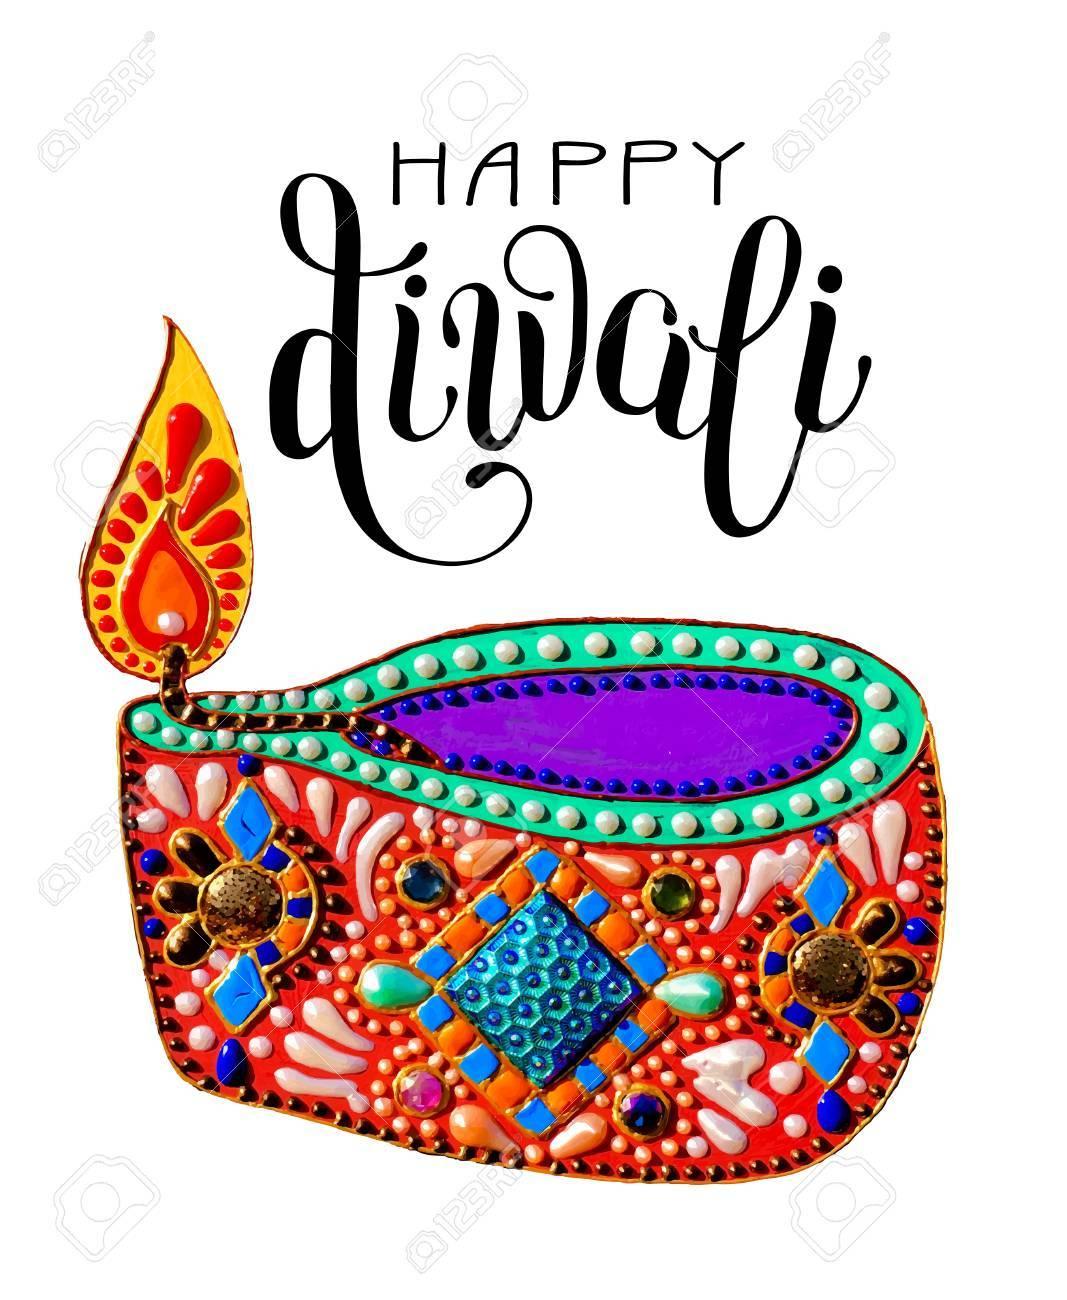 Original greeting card to deepavali festival with diya jewels original greeting card to deepavali festival with diya jewels painting and lettering inscription happy diwali m4hsunfo